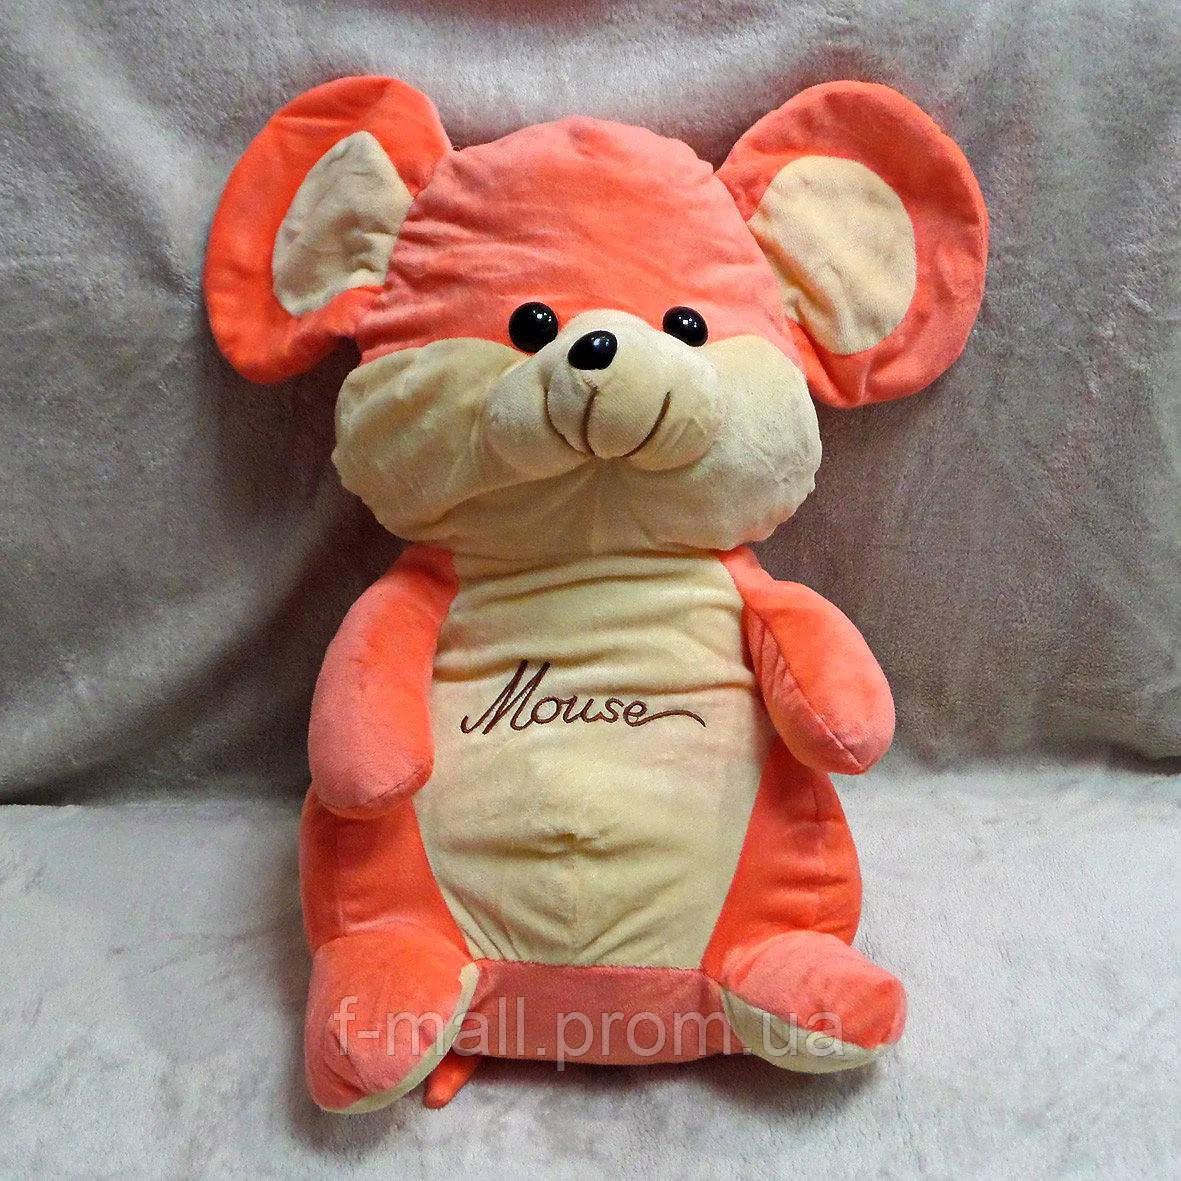 Плед мягкая игрушка 3 в 1 Мышка Mouse кораллово - бежевая (81)